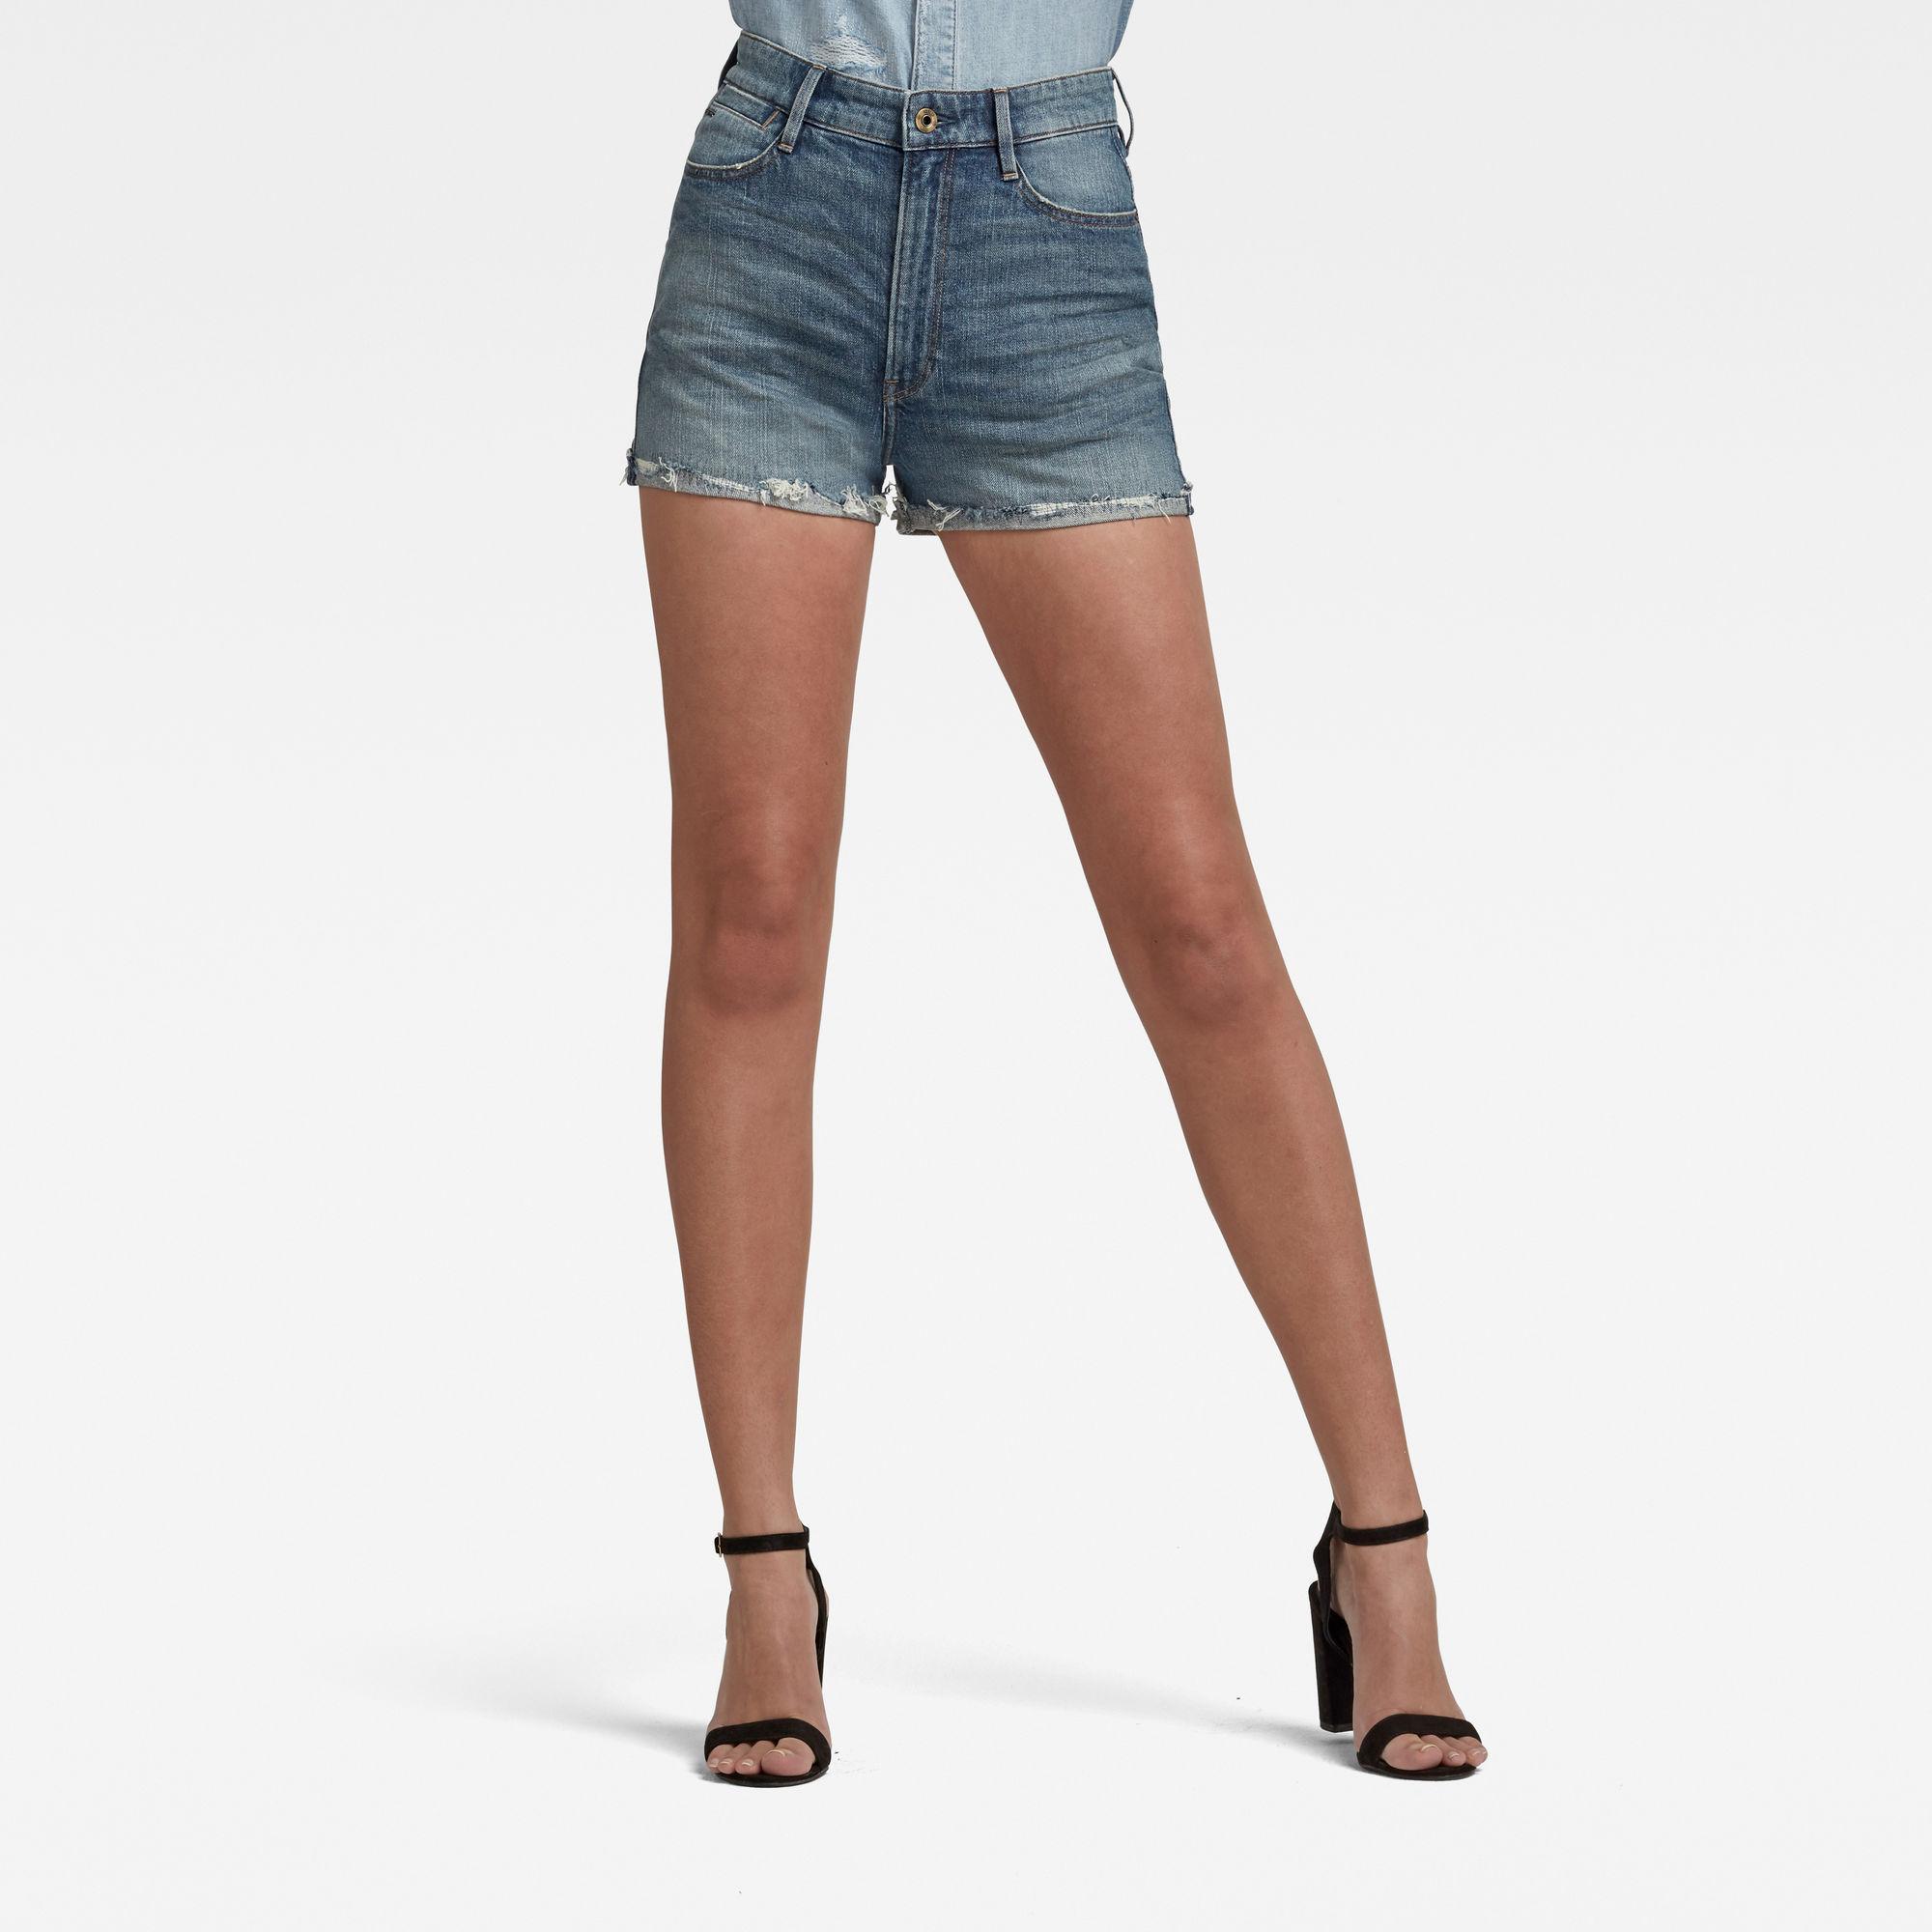 G-Star RAW Dames Tedie Ripped Edge Ultra High Shorts Blauw